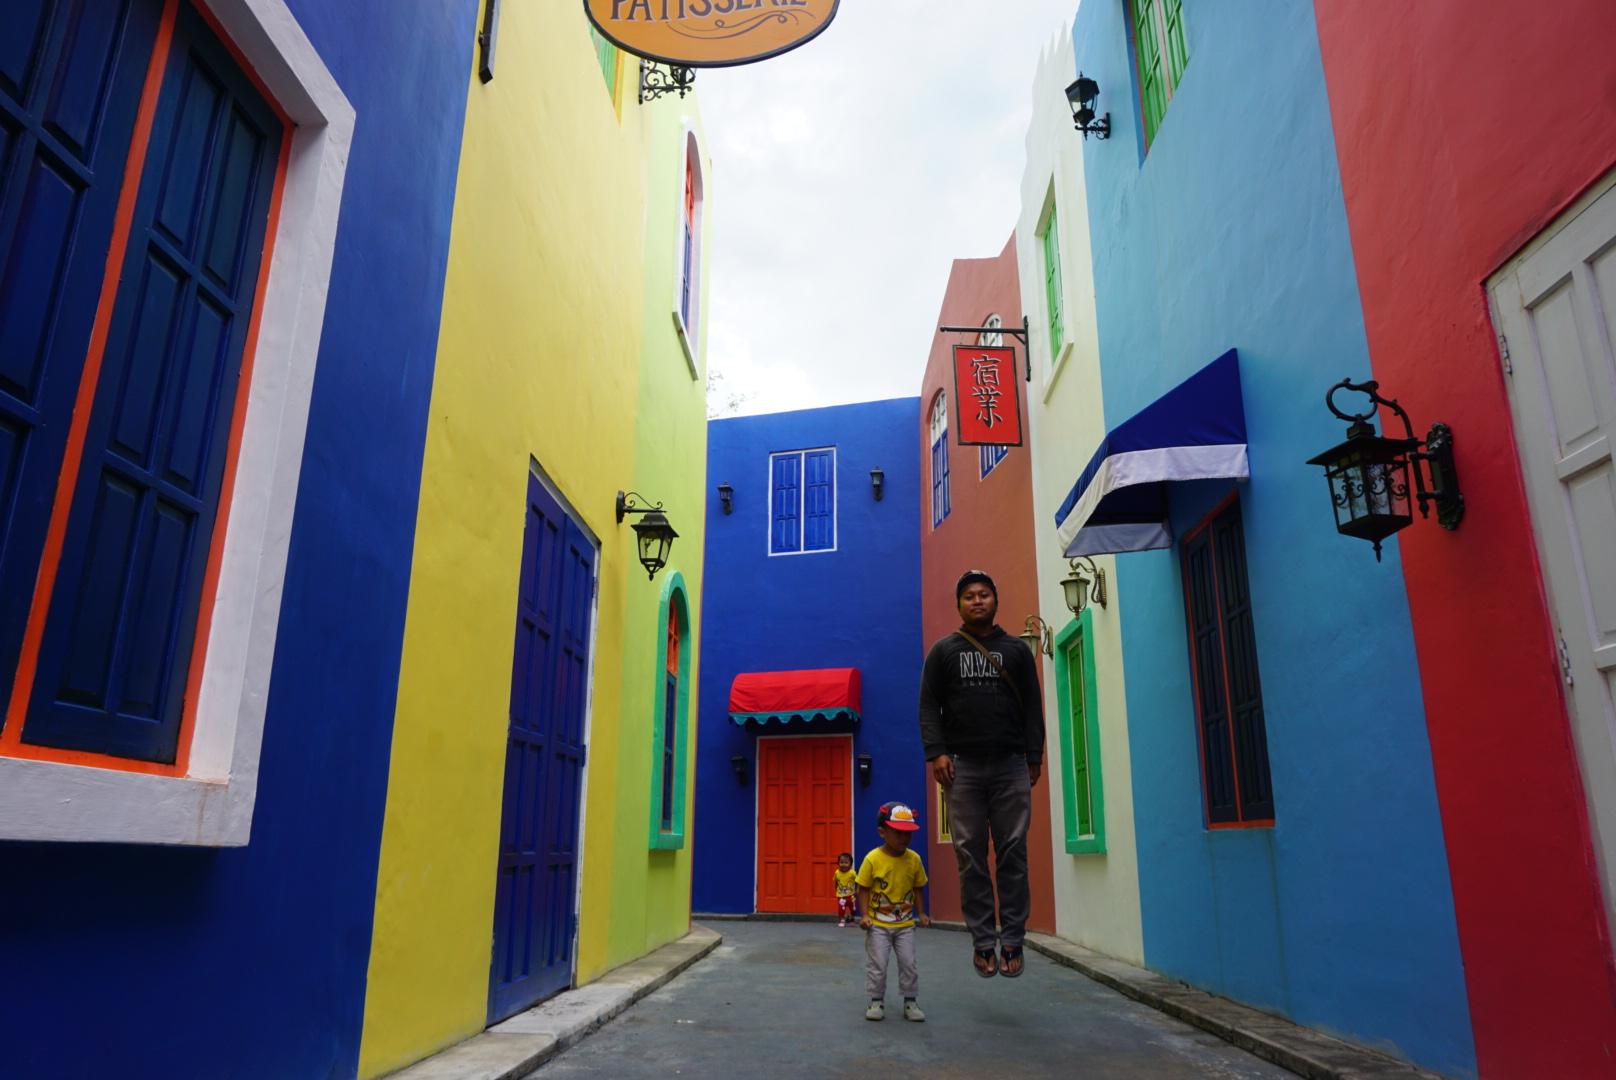 Wisata Jogja Ala Eropa, Spot Foto Baru di Bhumi Merapi, Sleman, Yogyakarta